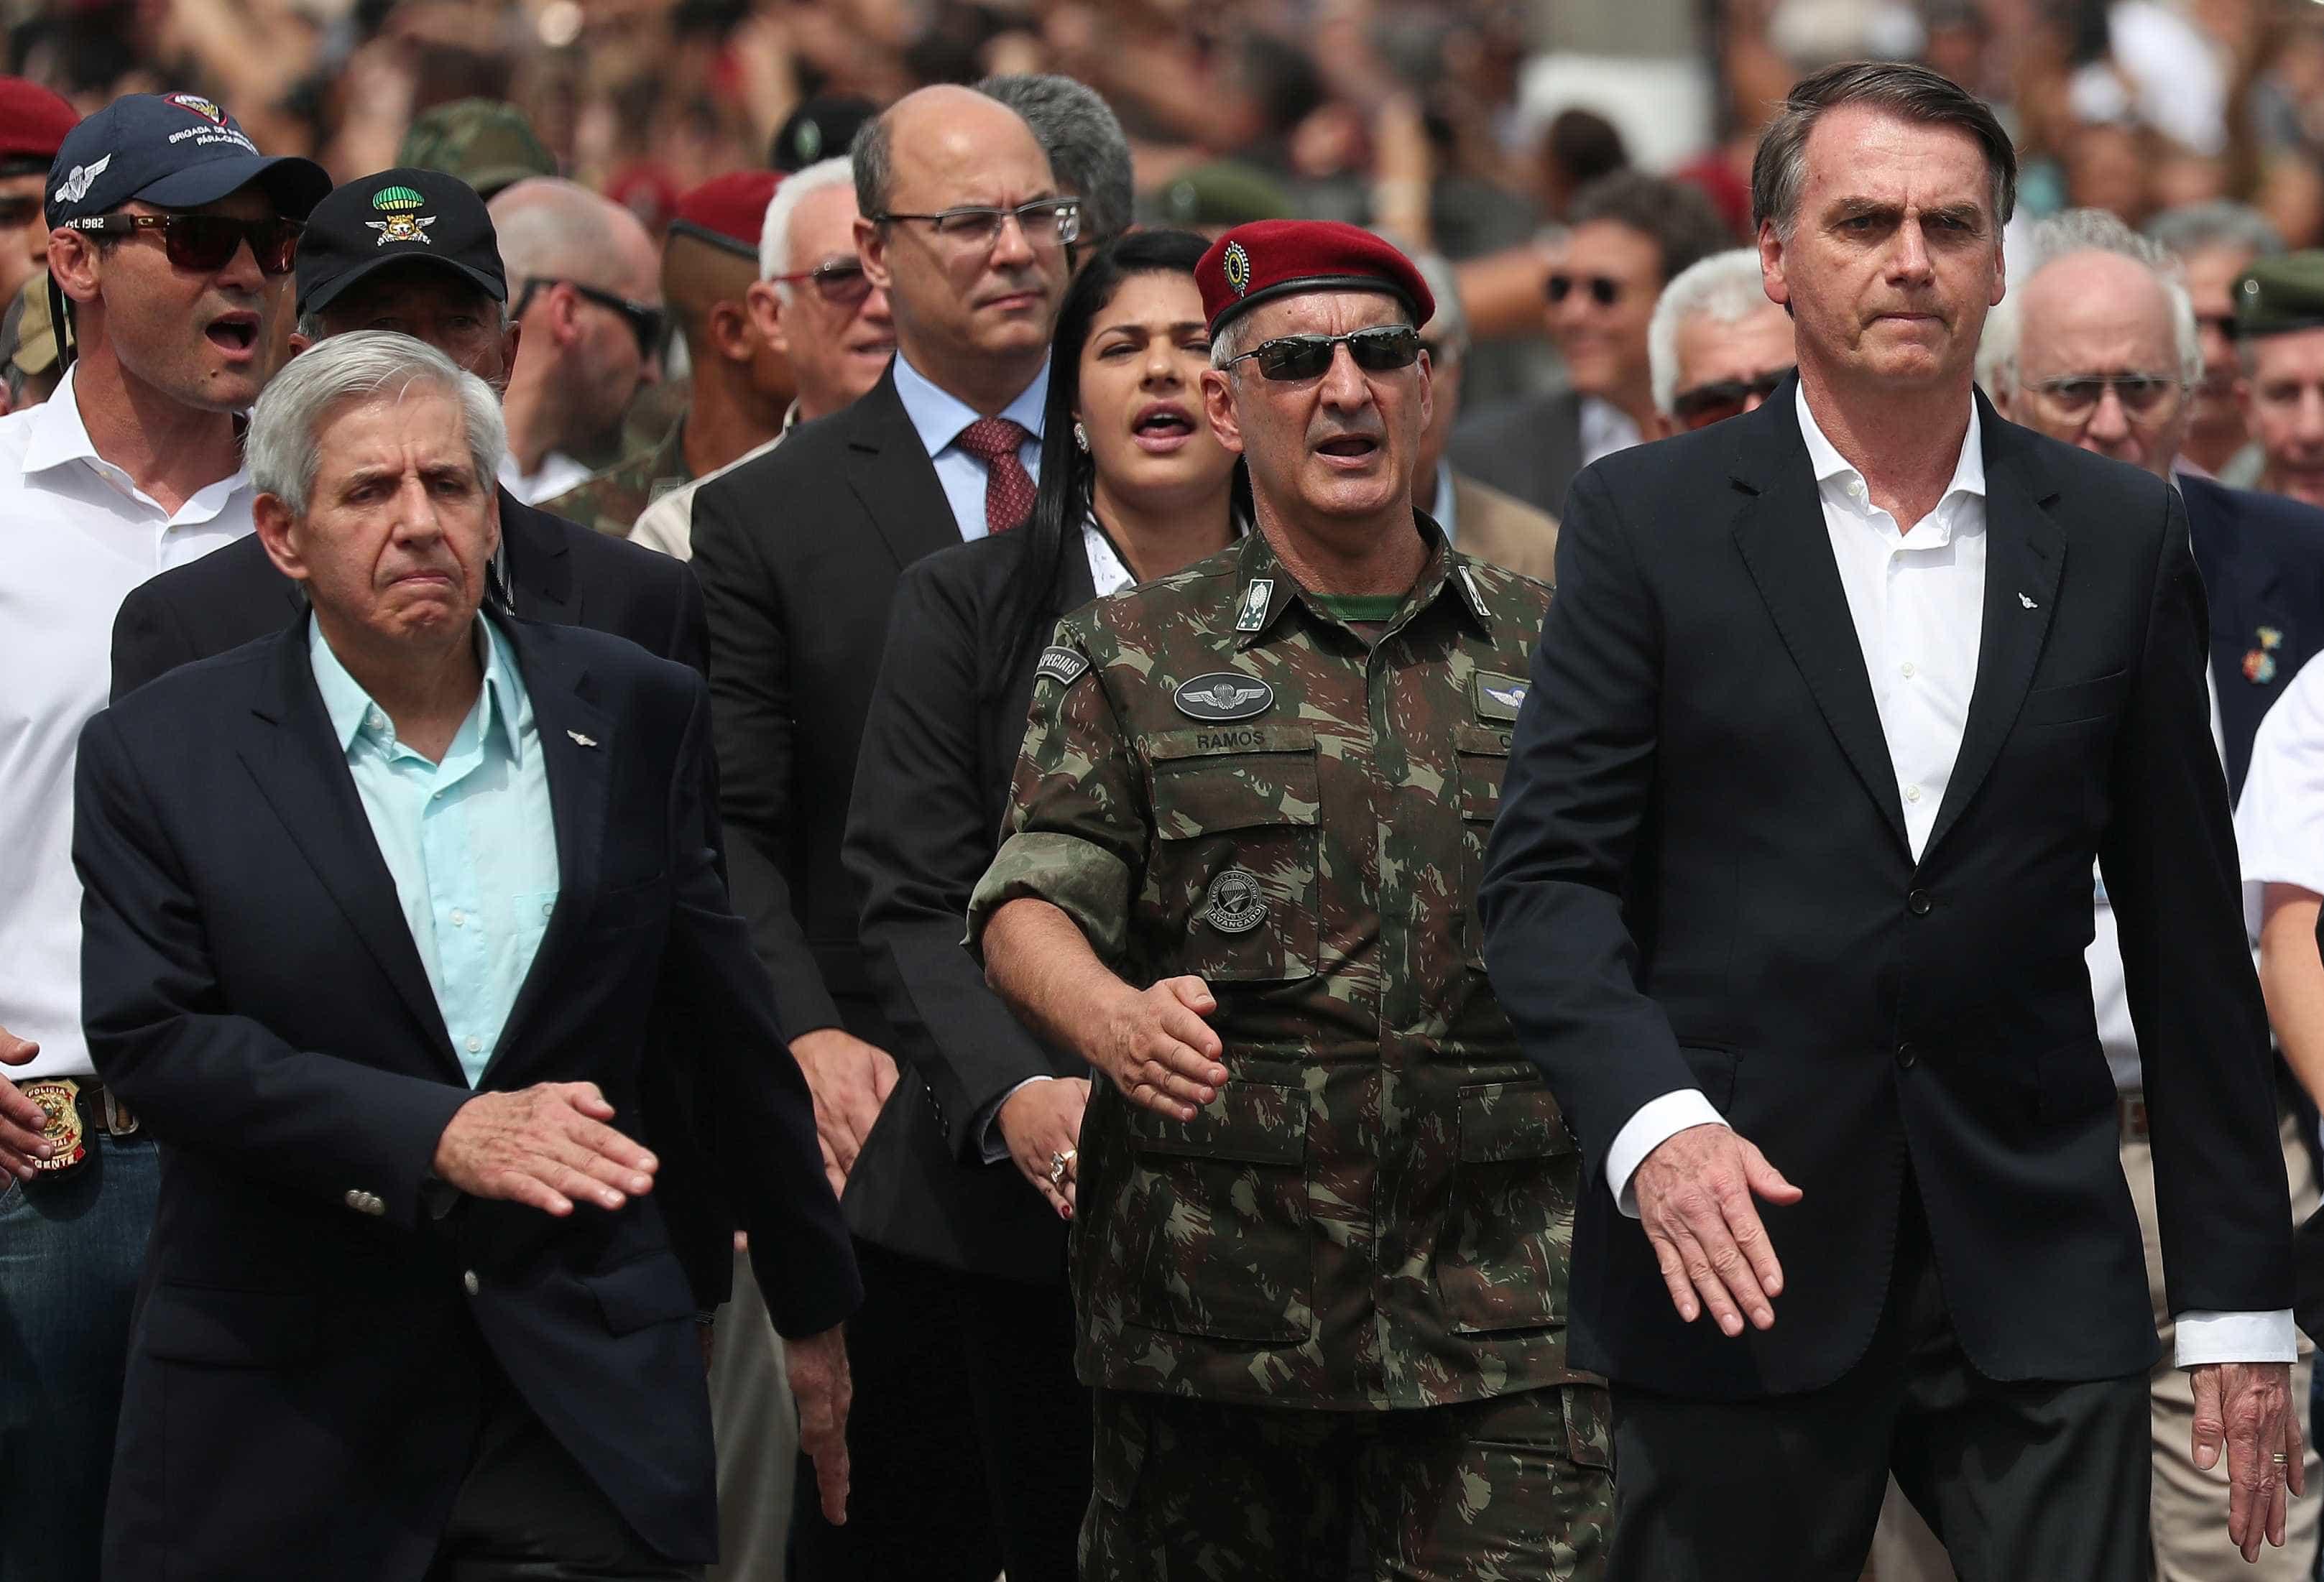 'Quando PT escalava terrorista, ninguém falava nada', diz Bolsonaro